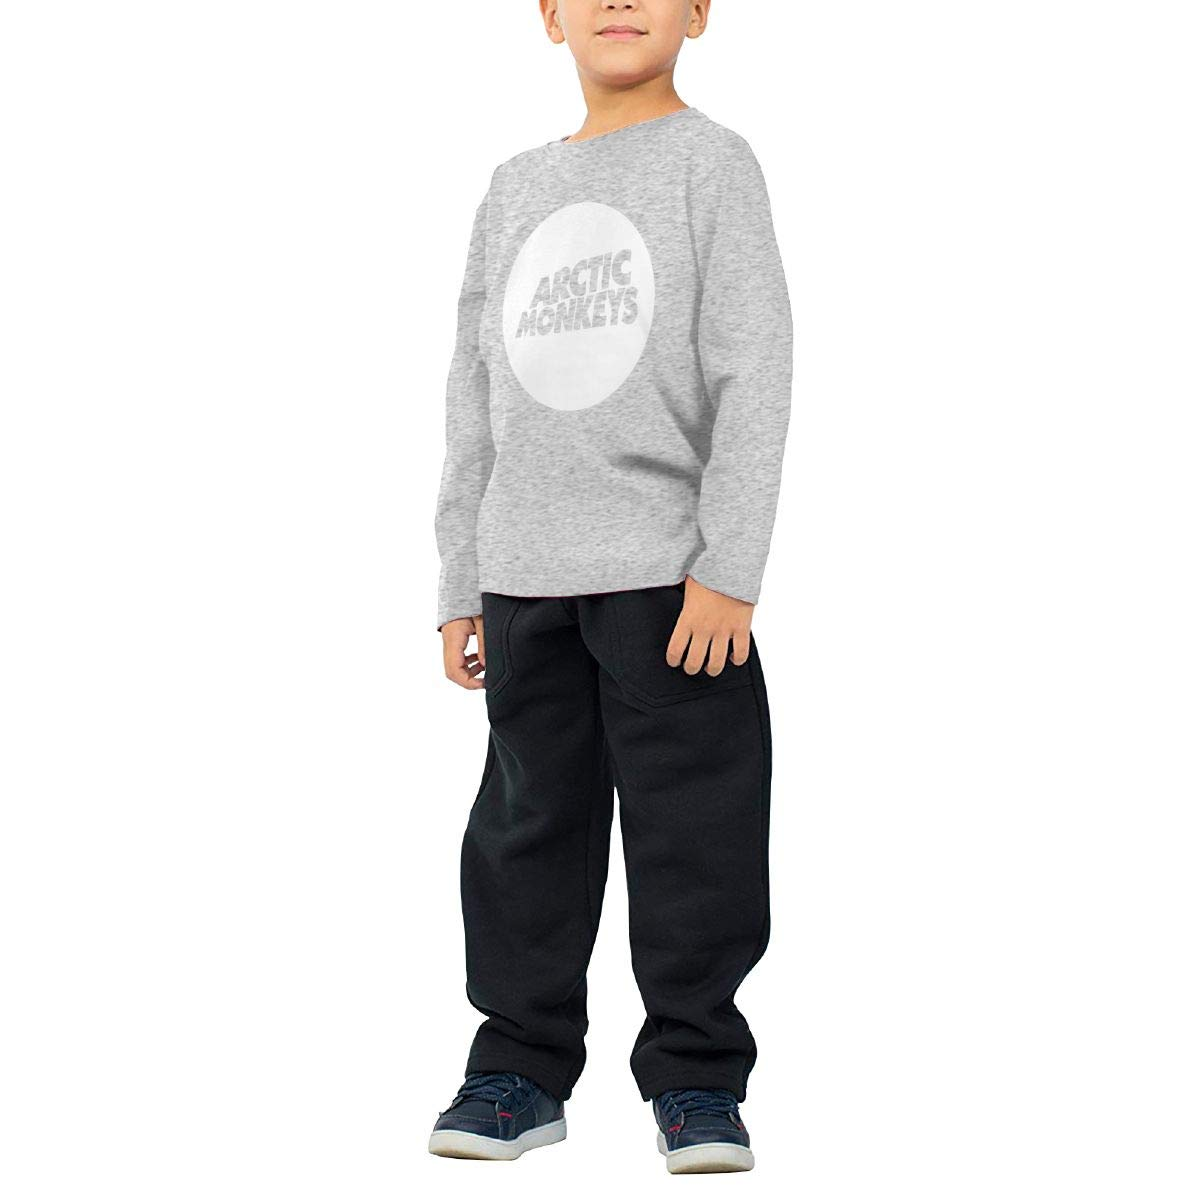 Arctic Monkey Childrens Cotton Gray Long Sleeve Round Neck Boys Or Girls T-Shirt